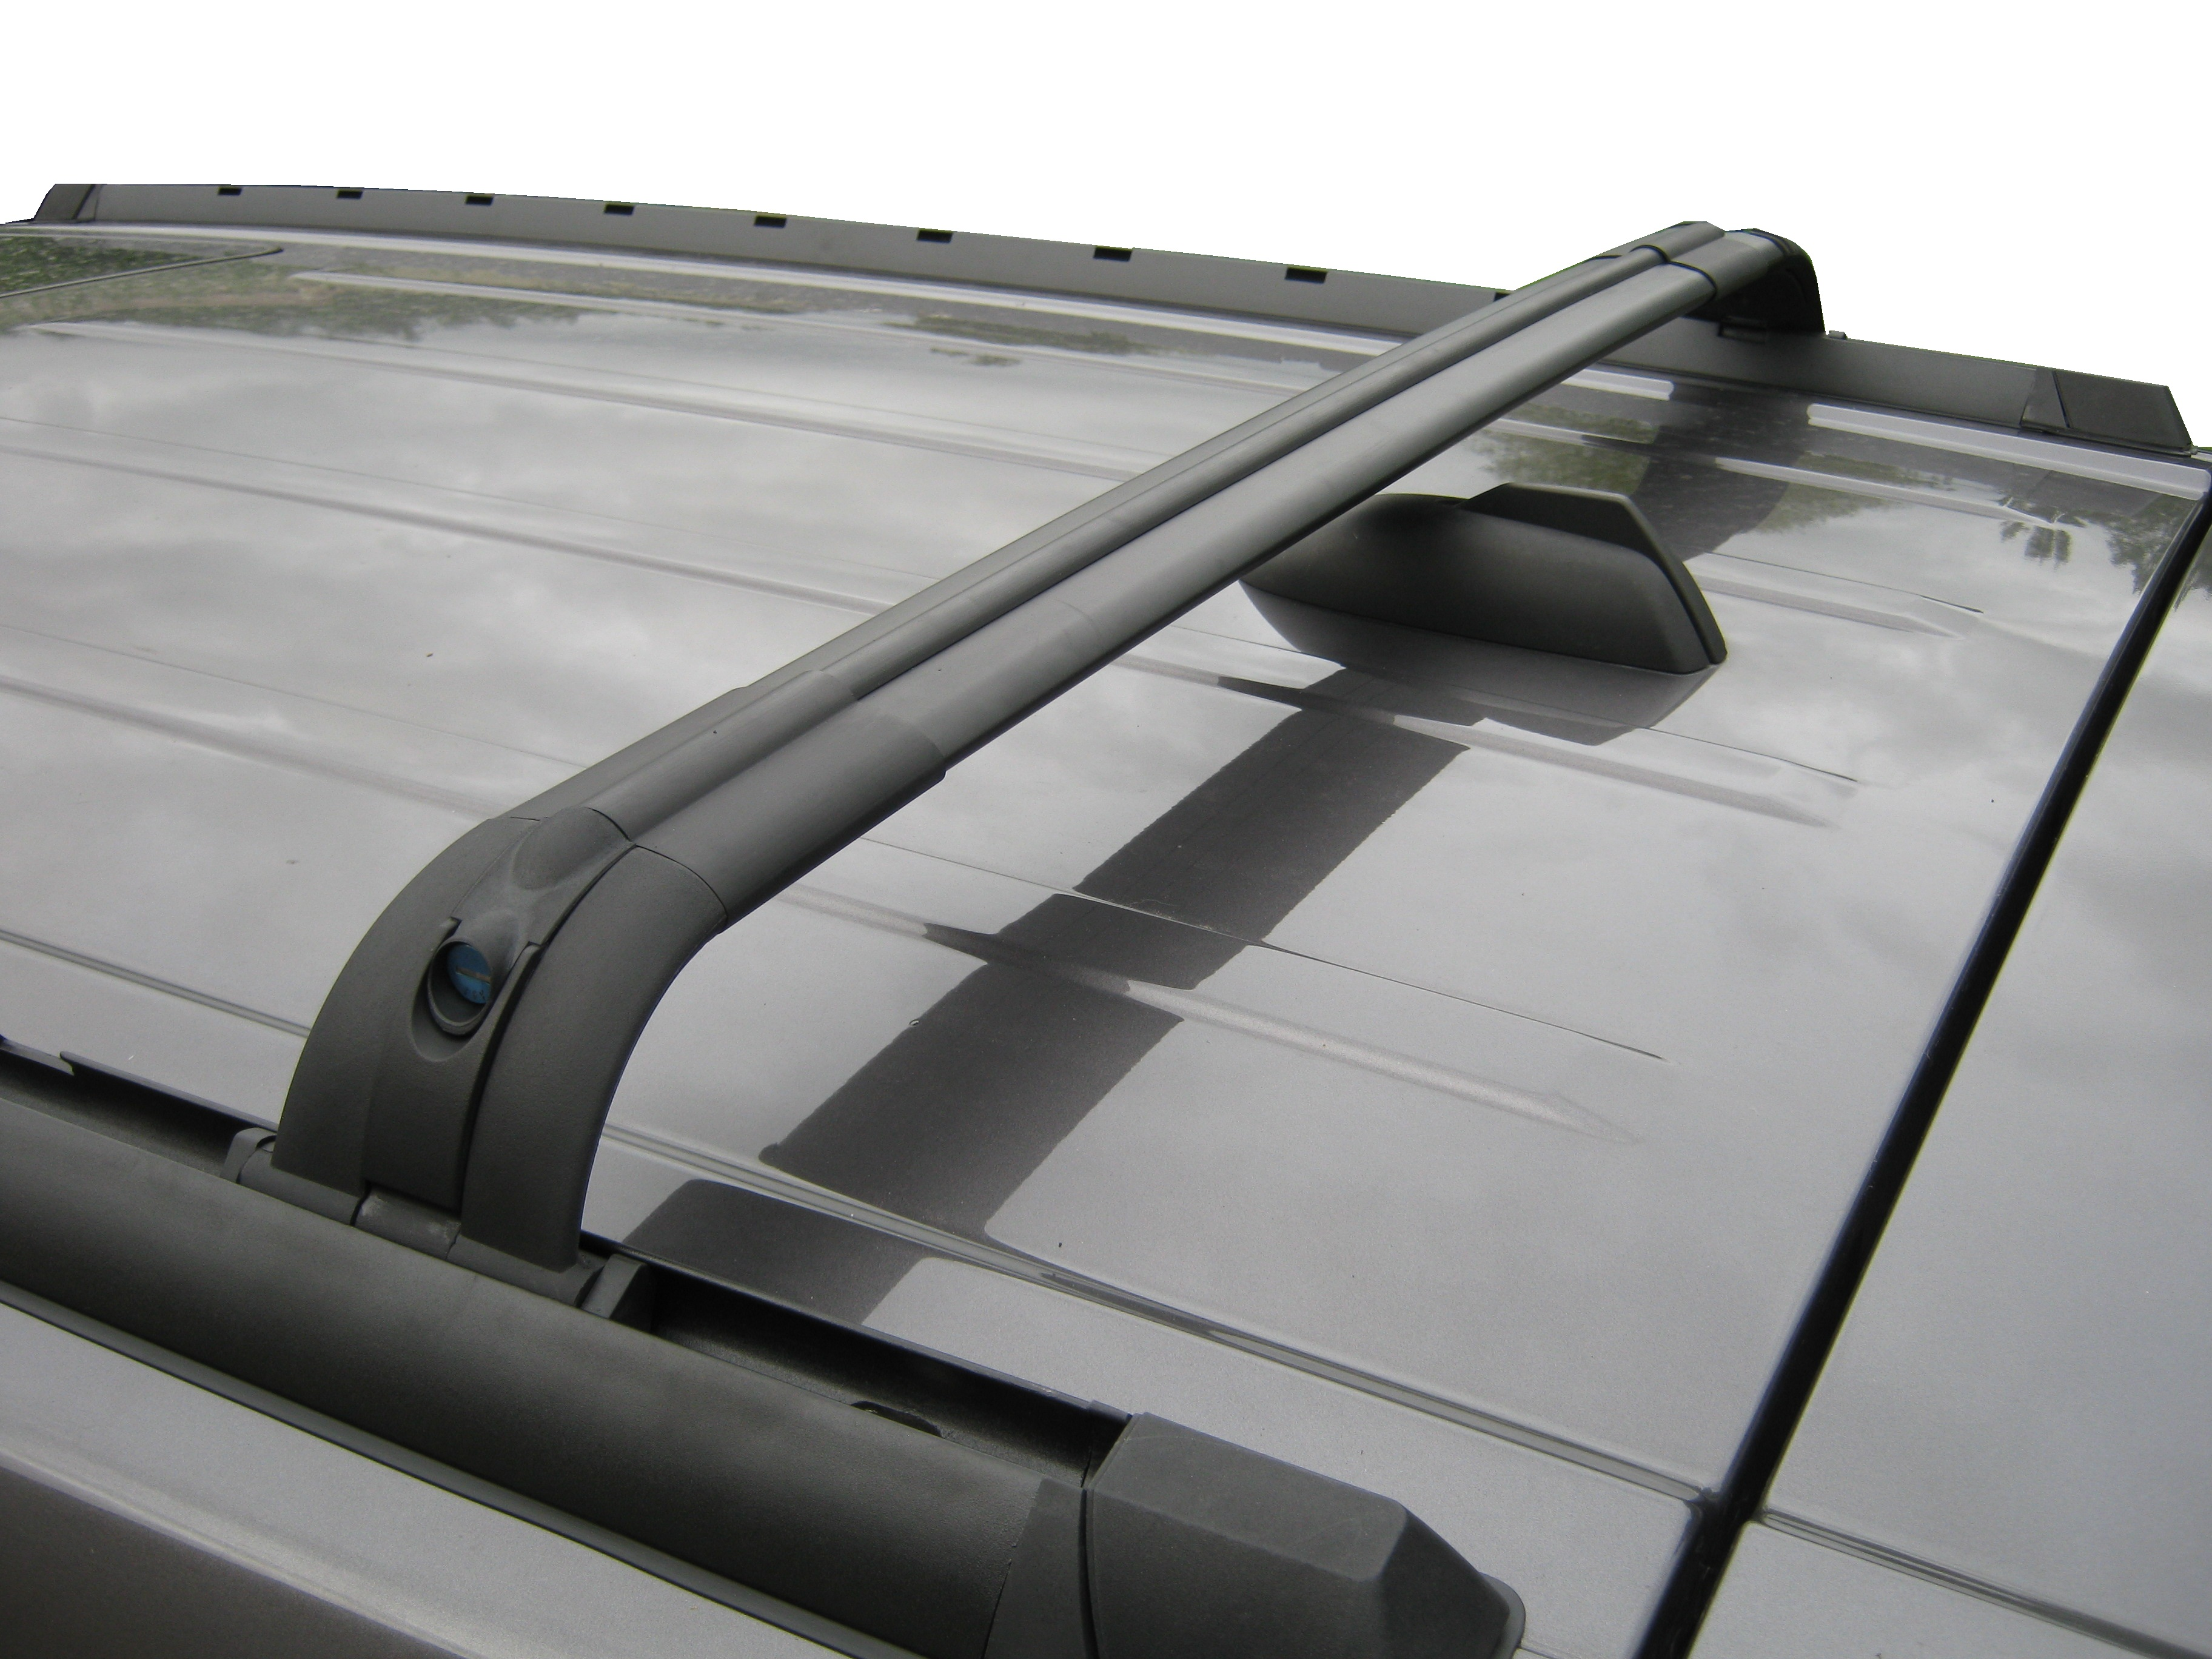 custom transit sdv roof rack galvanised duty west for uk ford steel heavy north racks rhino